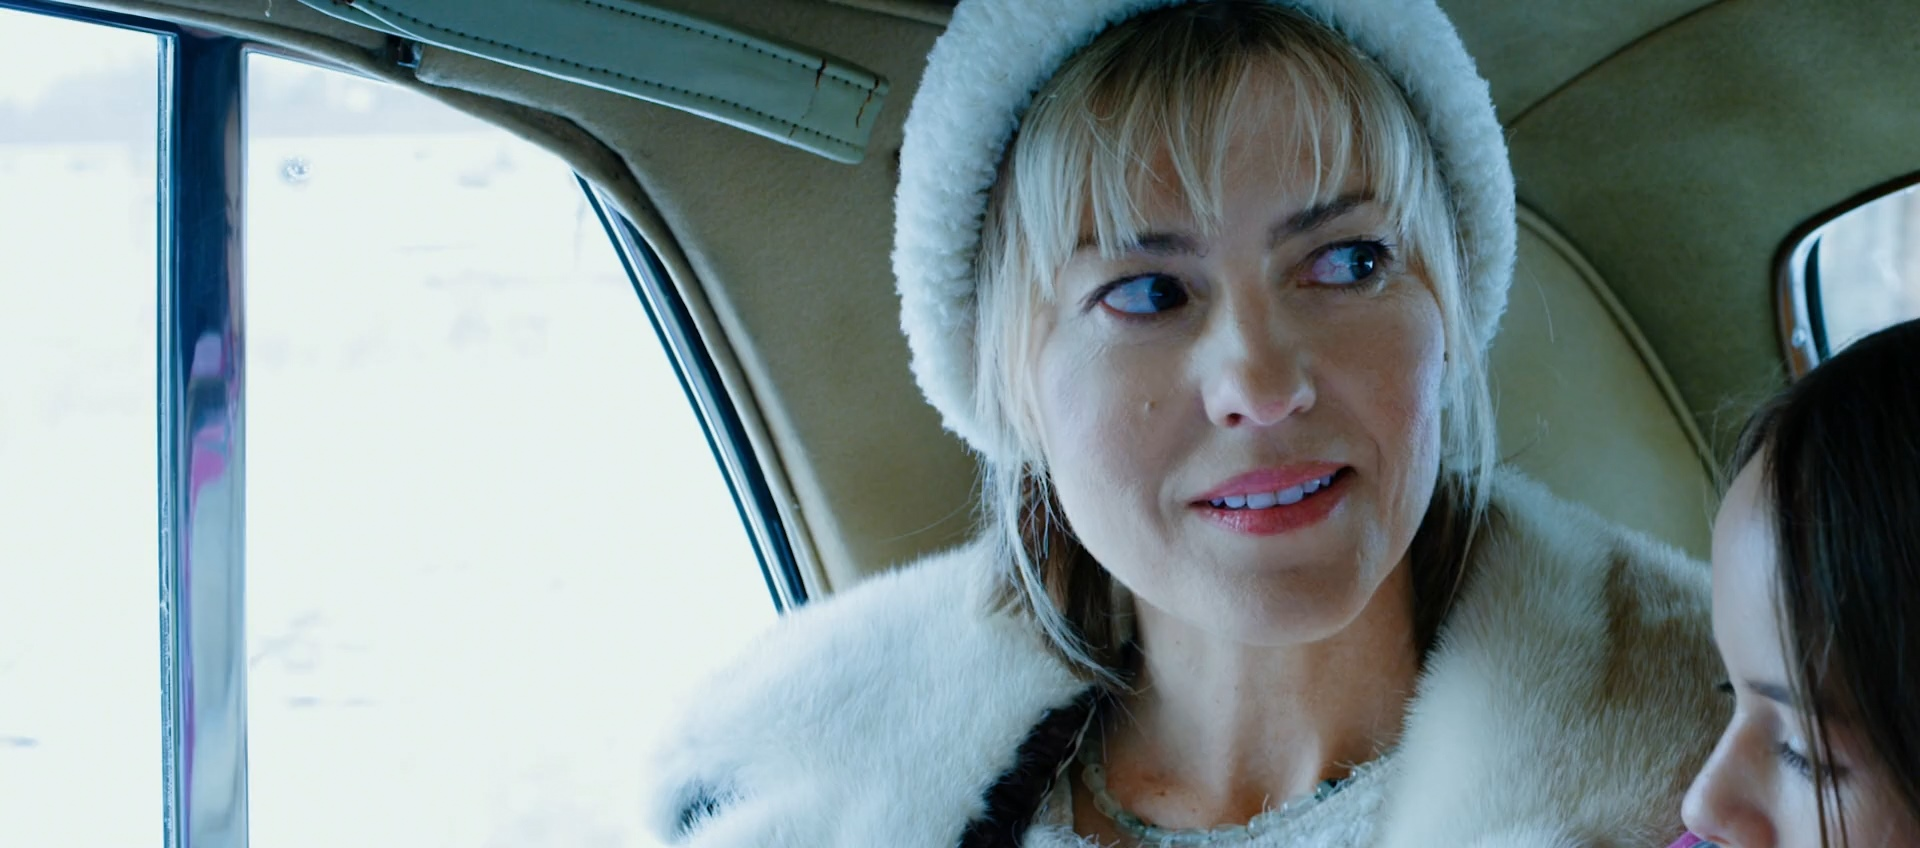 Rus Gelin | The Russian Bride | 2020 | BDRip | XviD | Türkçe Dublaj | m720p - m1080p | BluRay | Dual | TR-EN | Tek Link